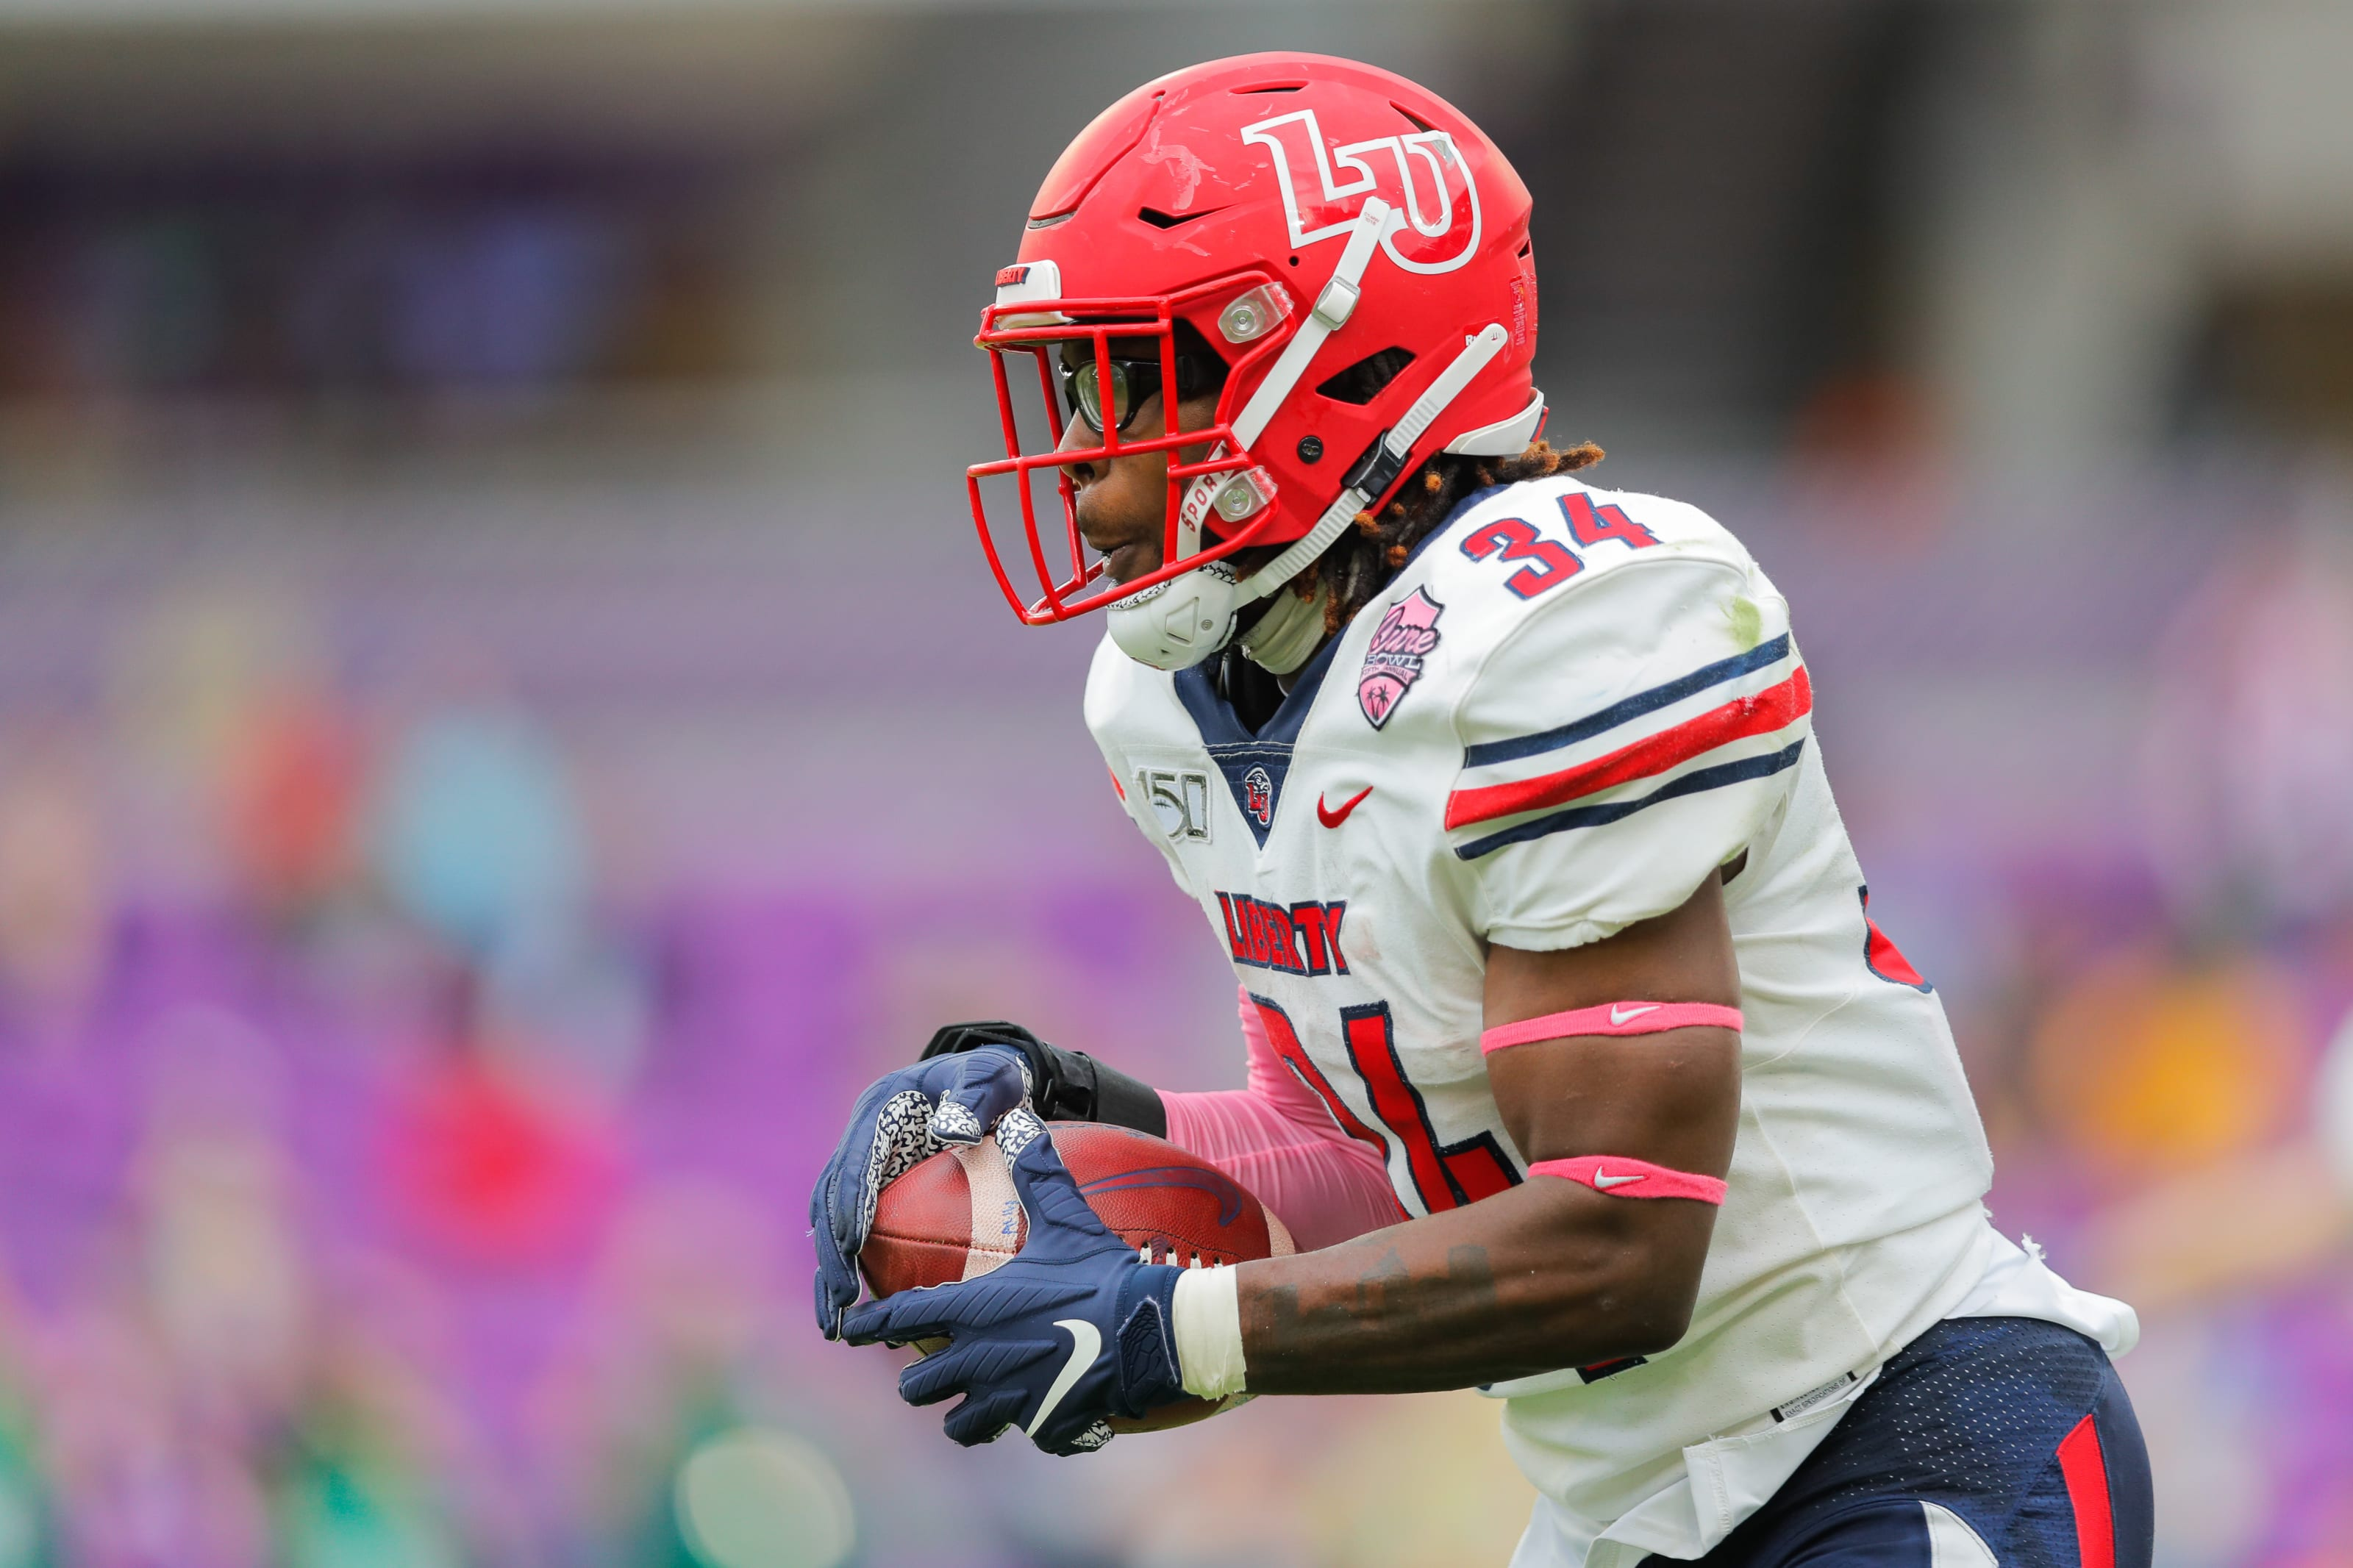 2021 NFL Draft, Joshua Mack